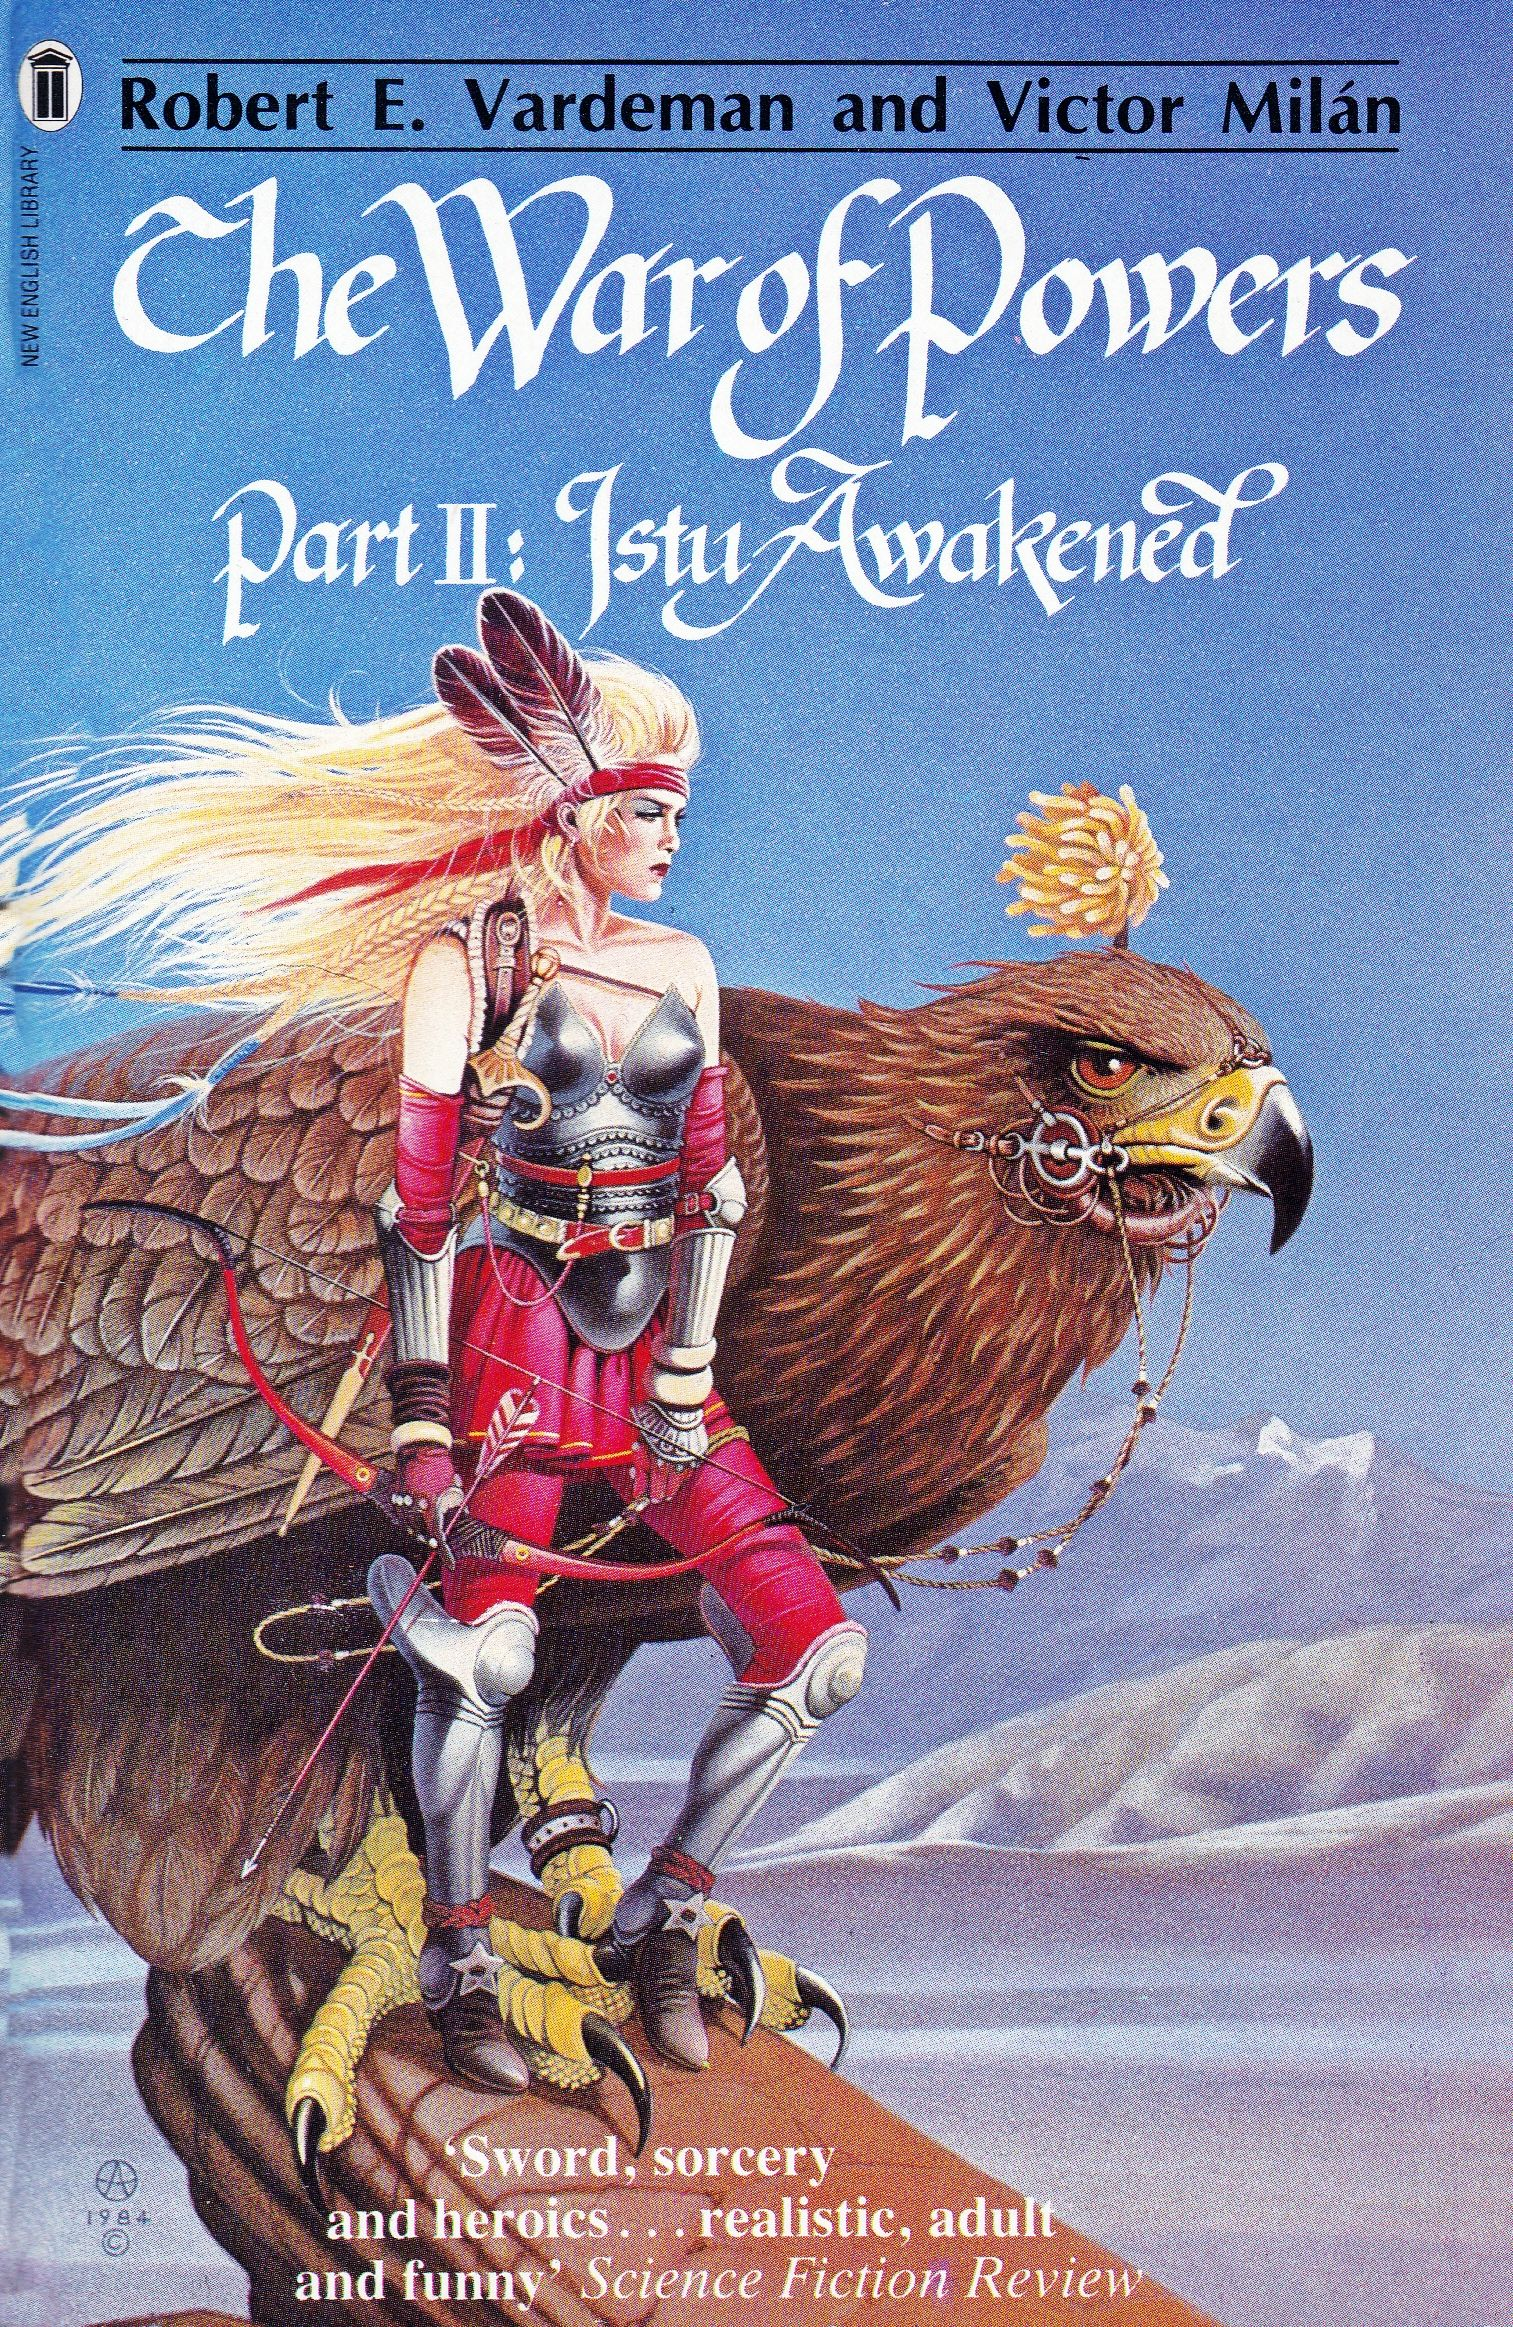 Robert E Vardman And Victor Milan The War Of Powers Part 2 Istu Awakened Horror Book Covers Fantasy Book Covers Horror Book